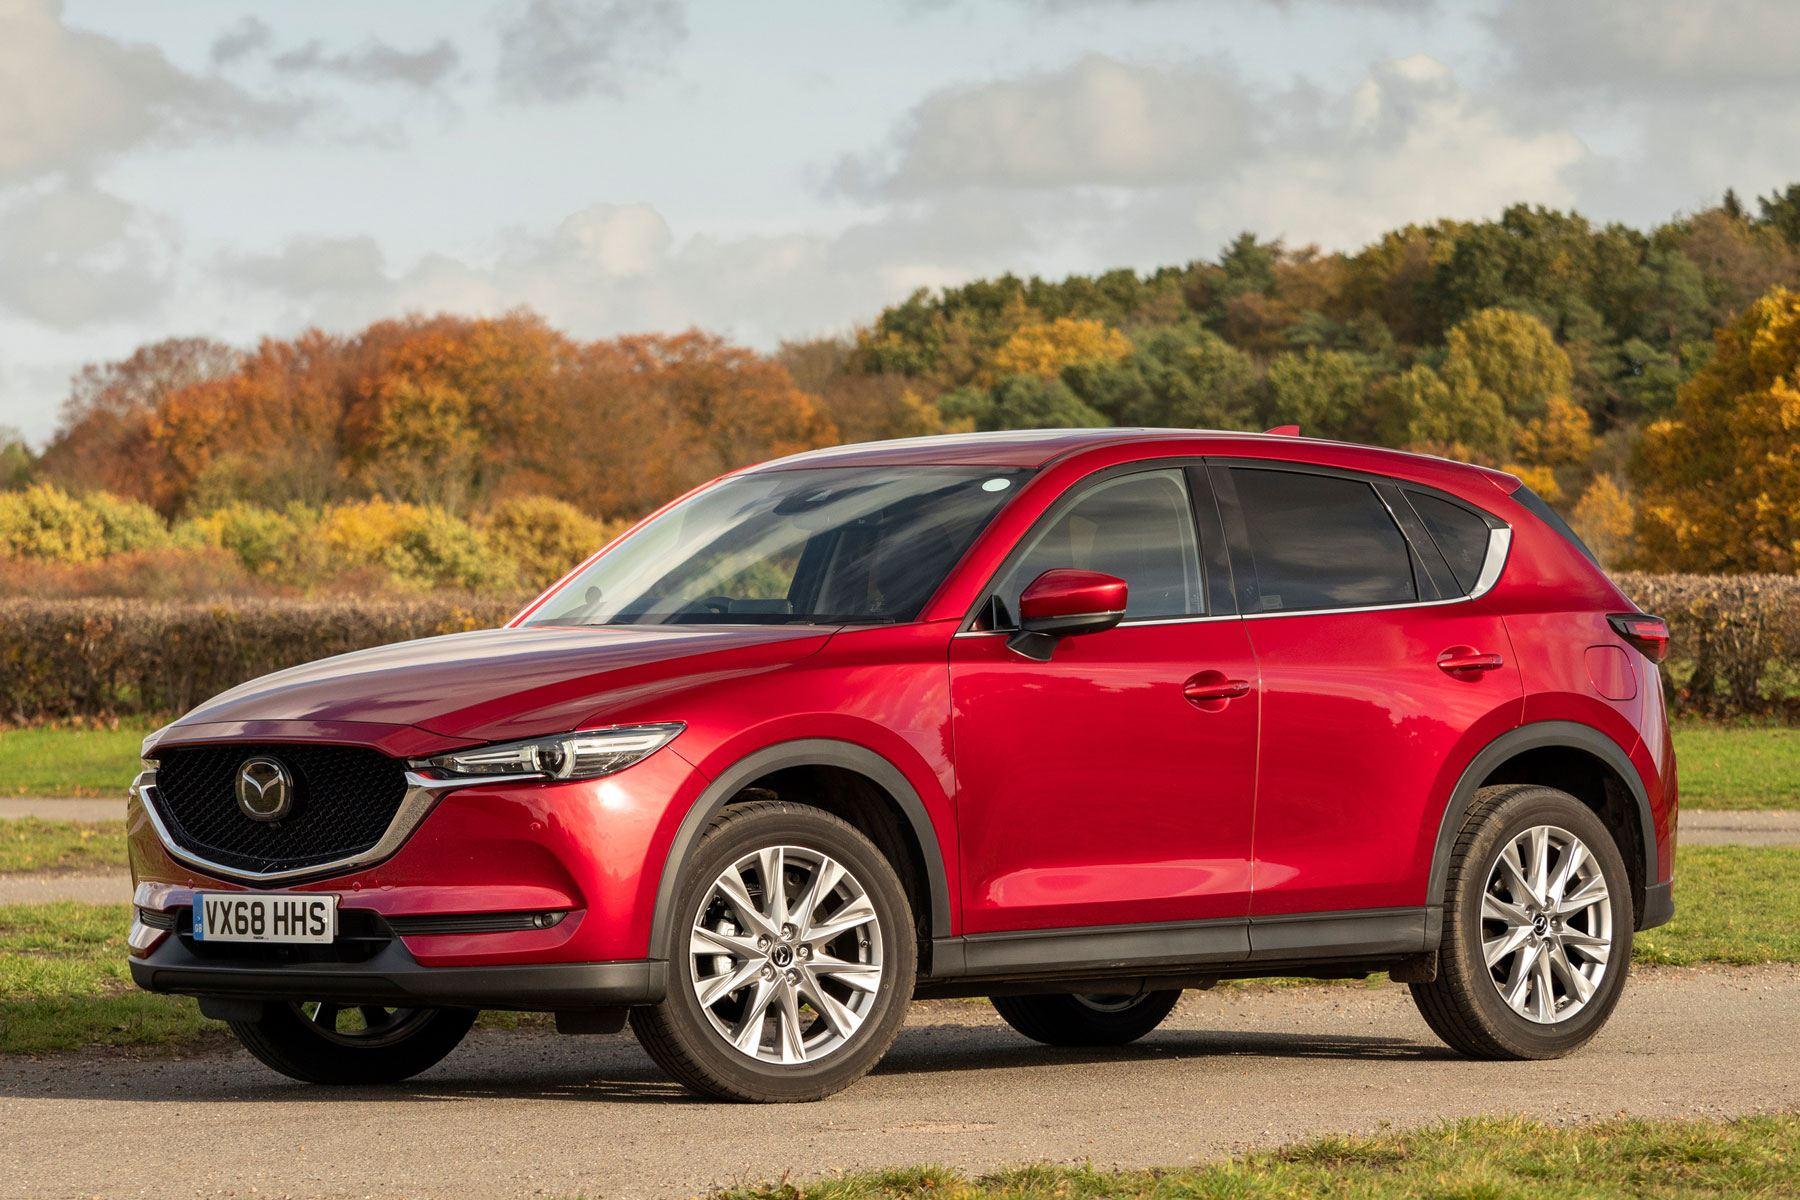 Mazda CX-5 2017 side exterior